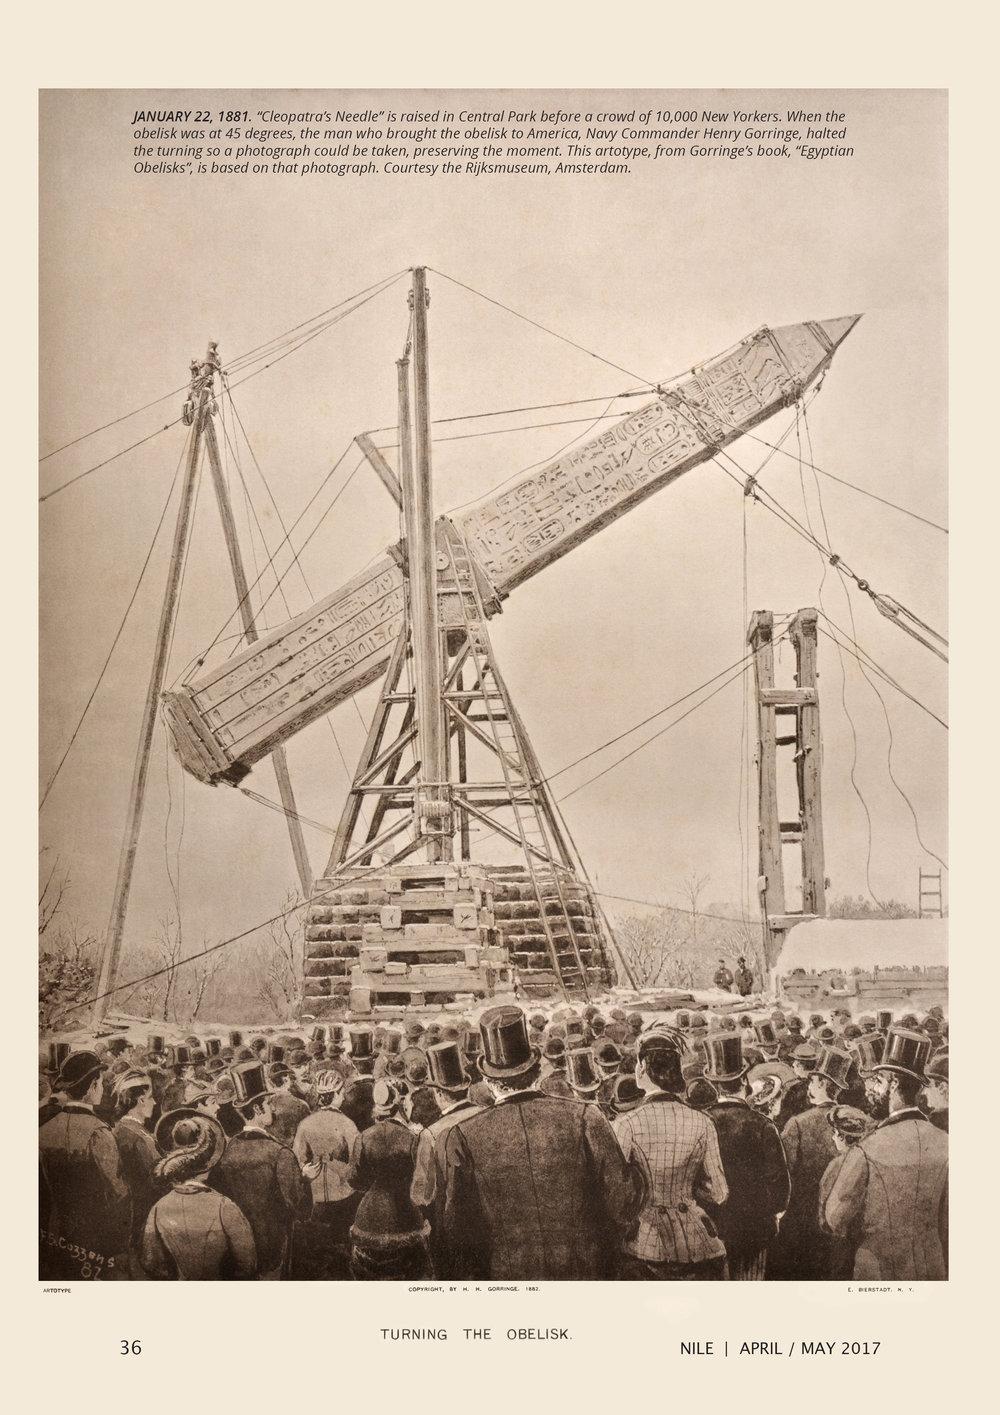 Nile 7, NY Obelisk 1A.jpg